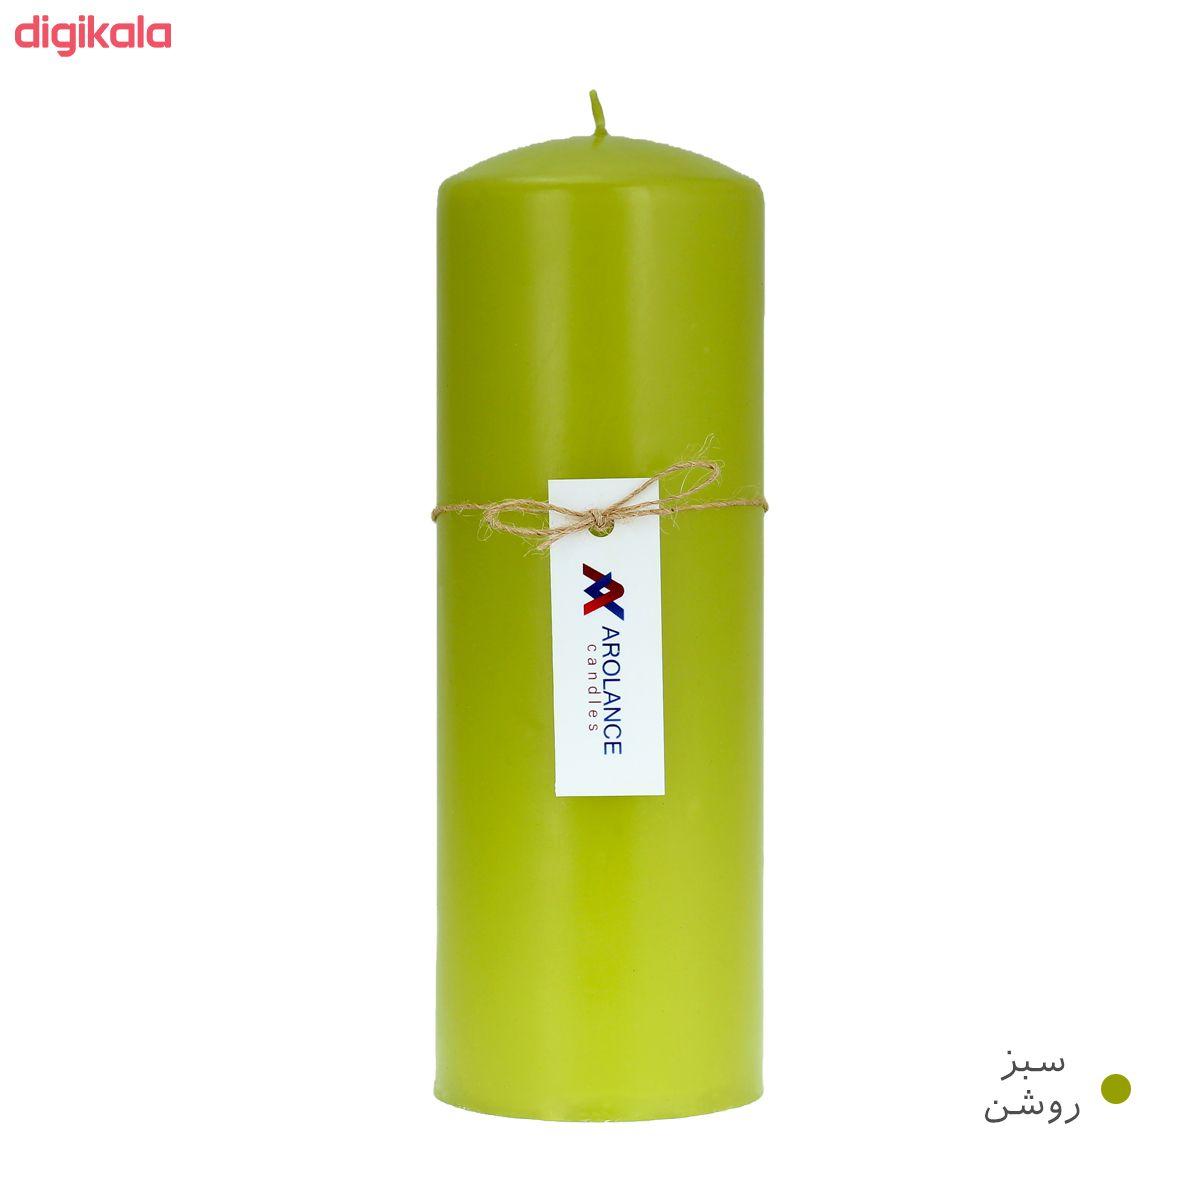 شمع آرولنس طرح استوانه مدل D720 main 1 3